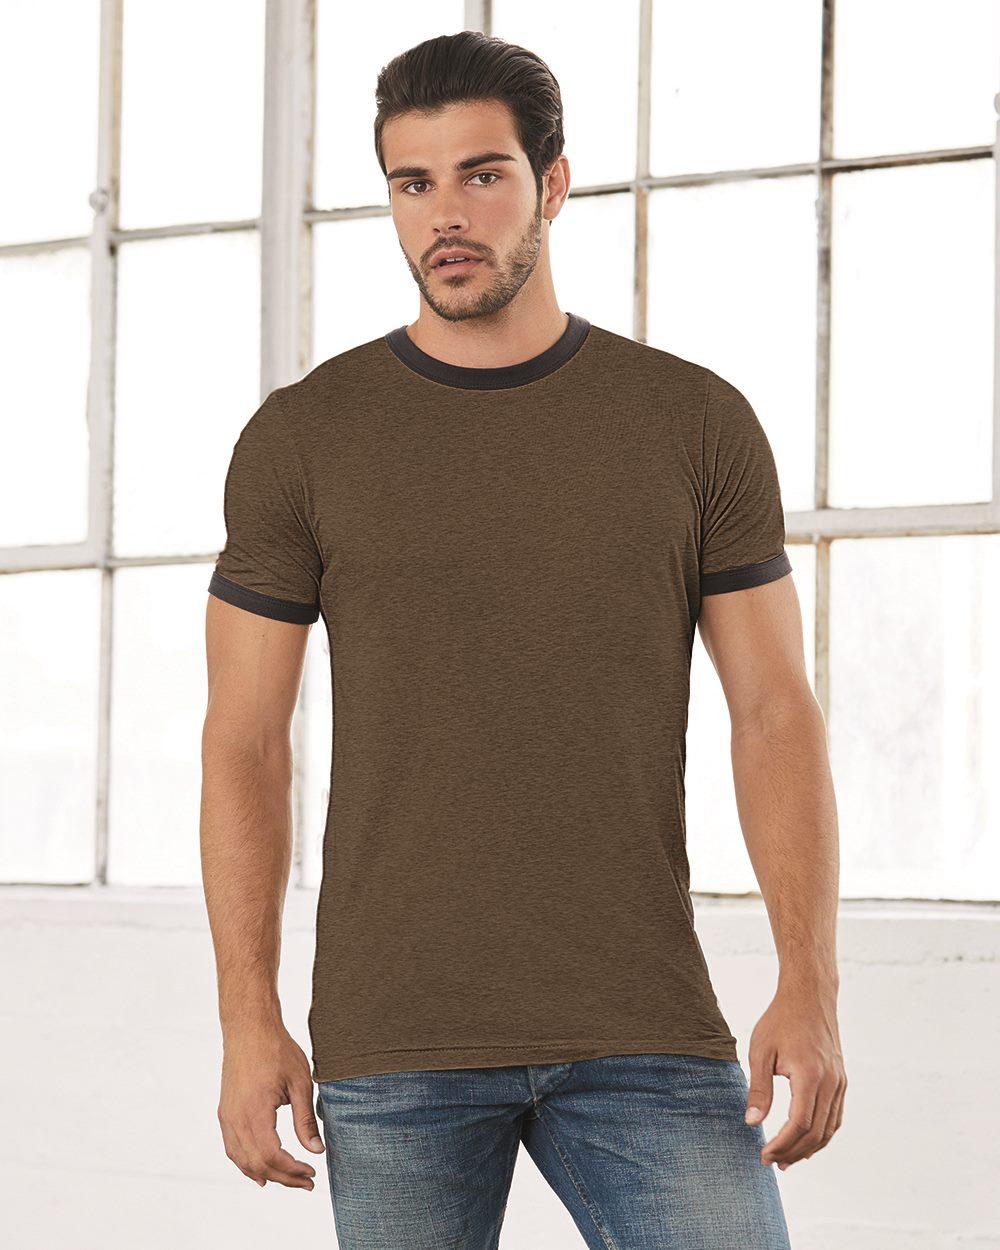 0ee01a0b Bella B6050 Women's Heather Ringer T $6.00 - Women's T-Shirts